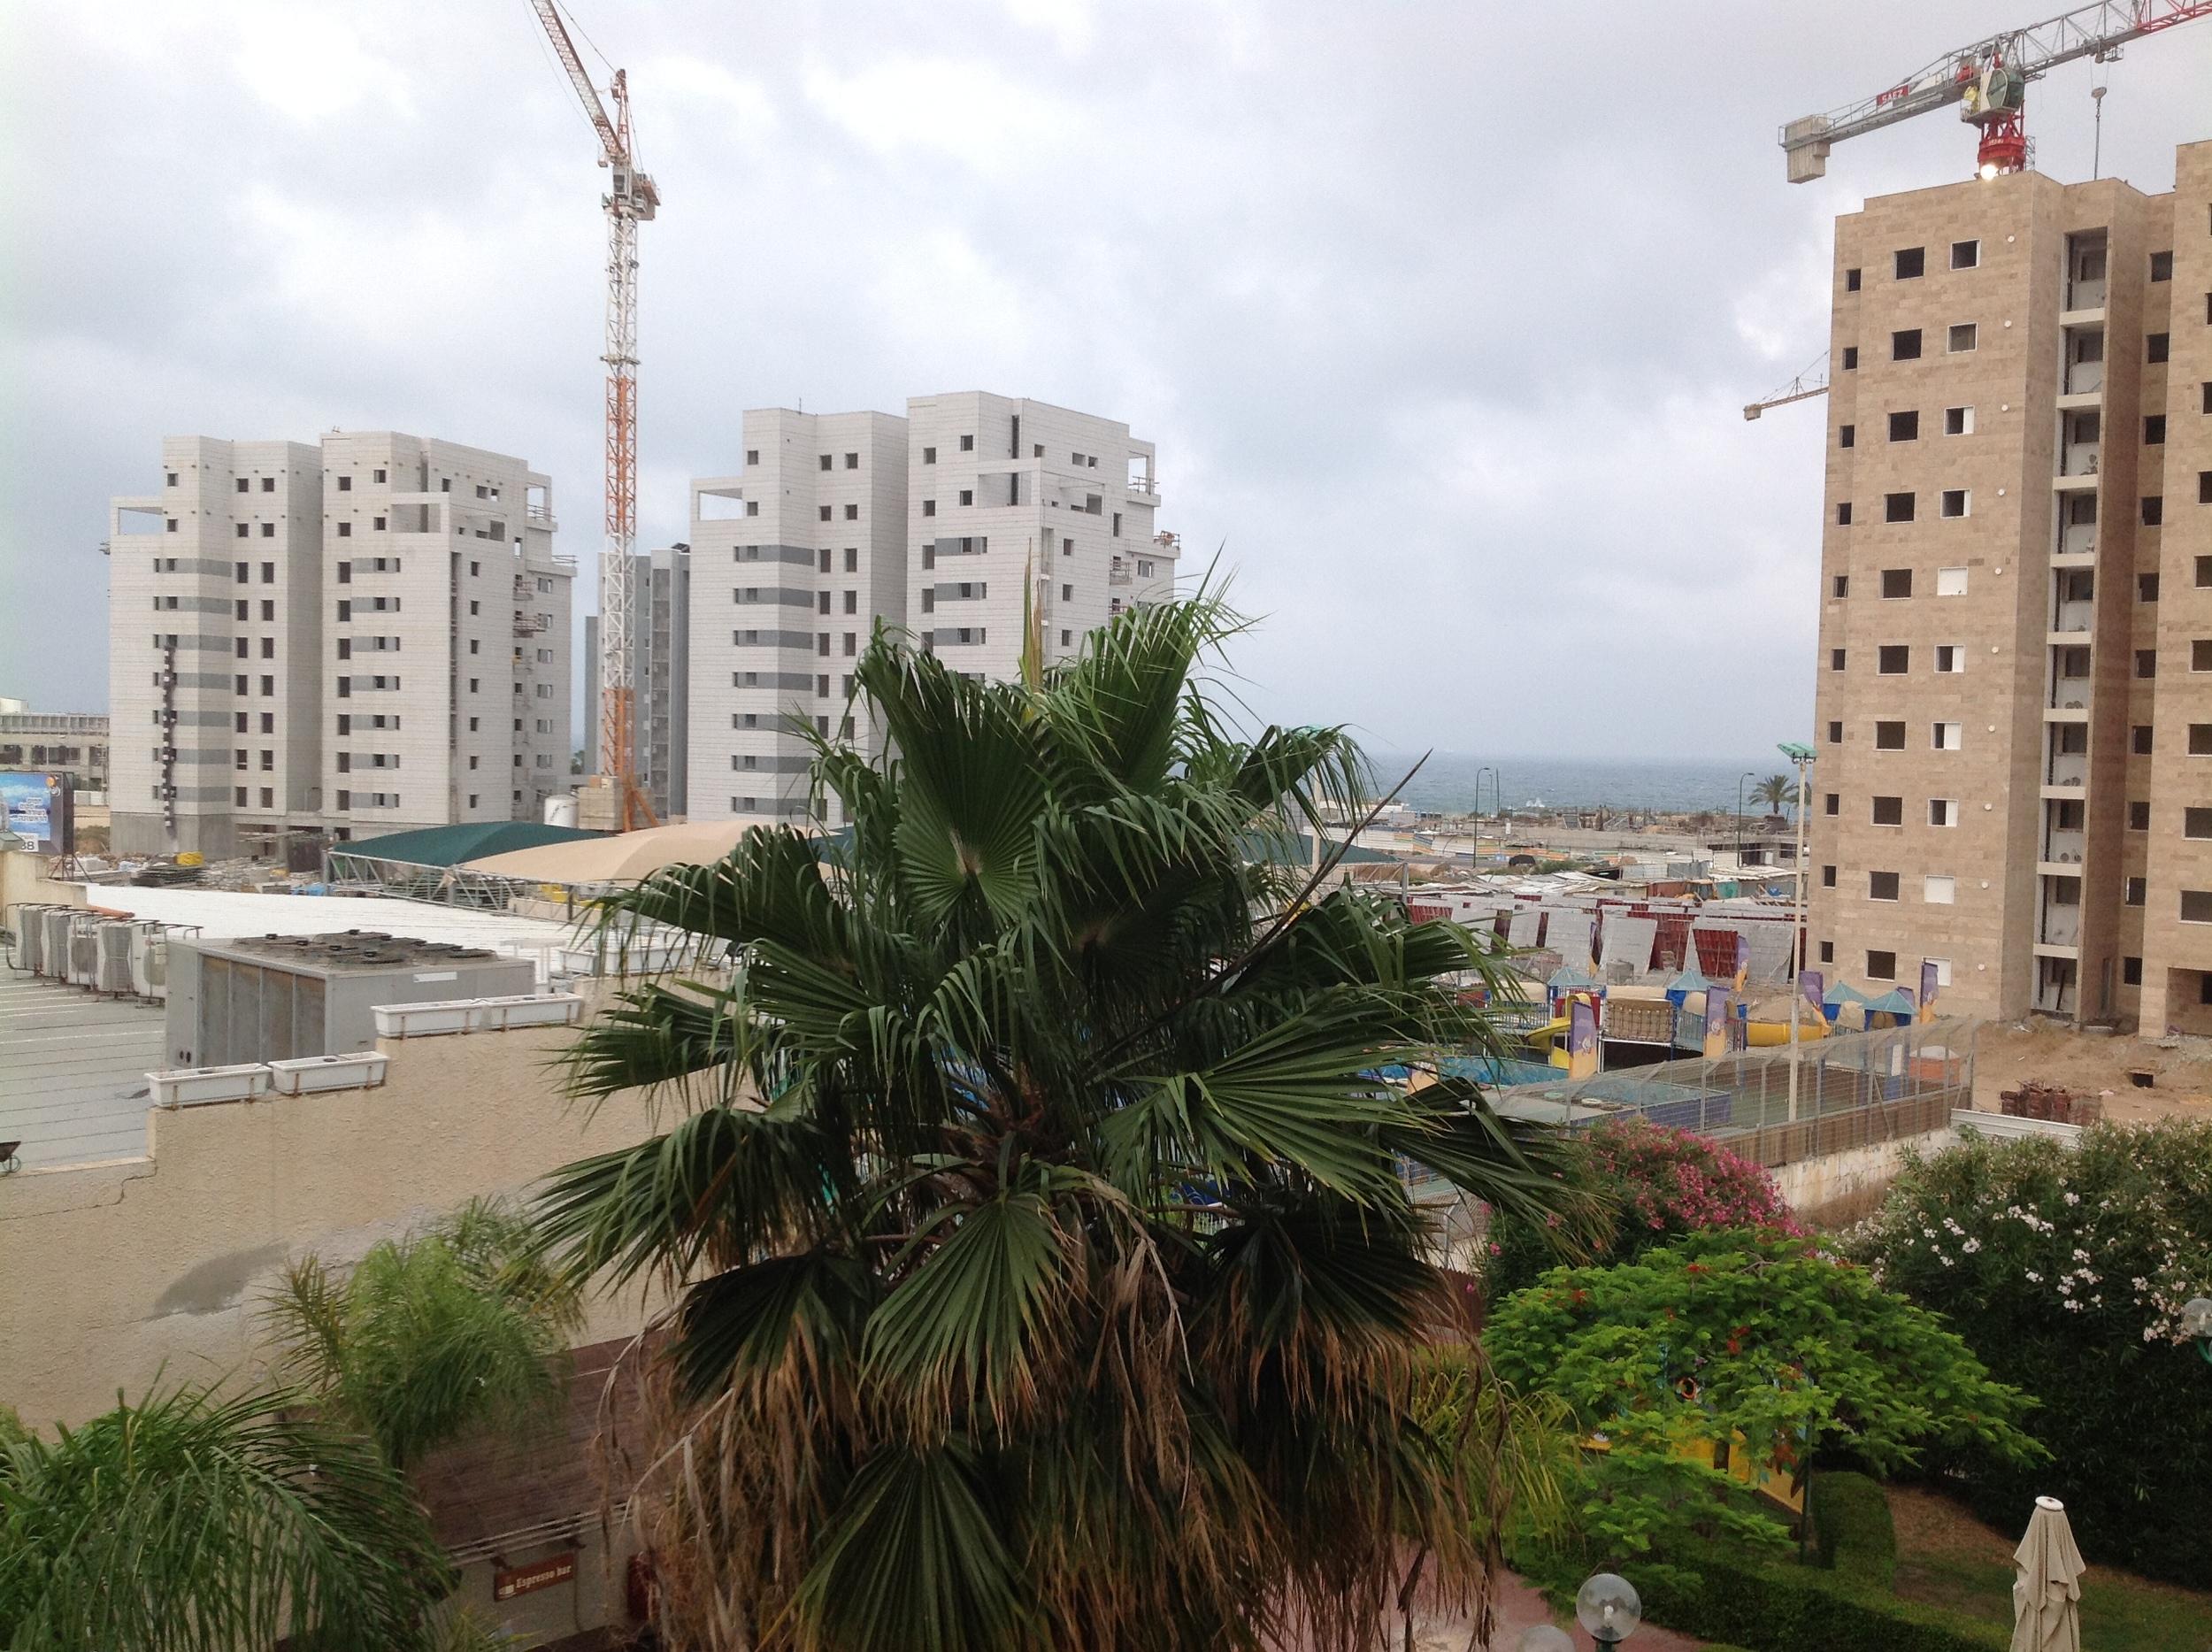 New construction around the Dan Gardens Hotel